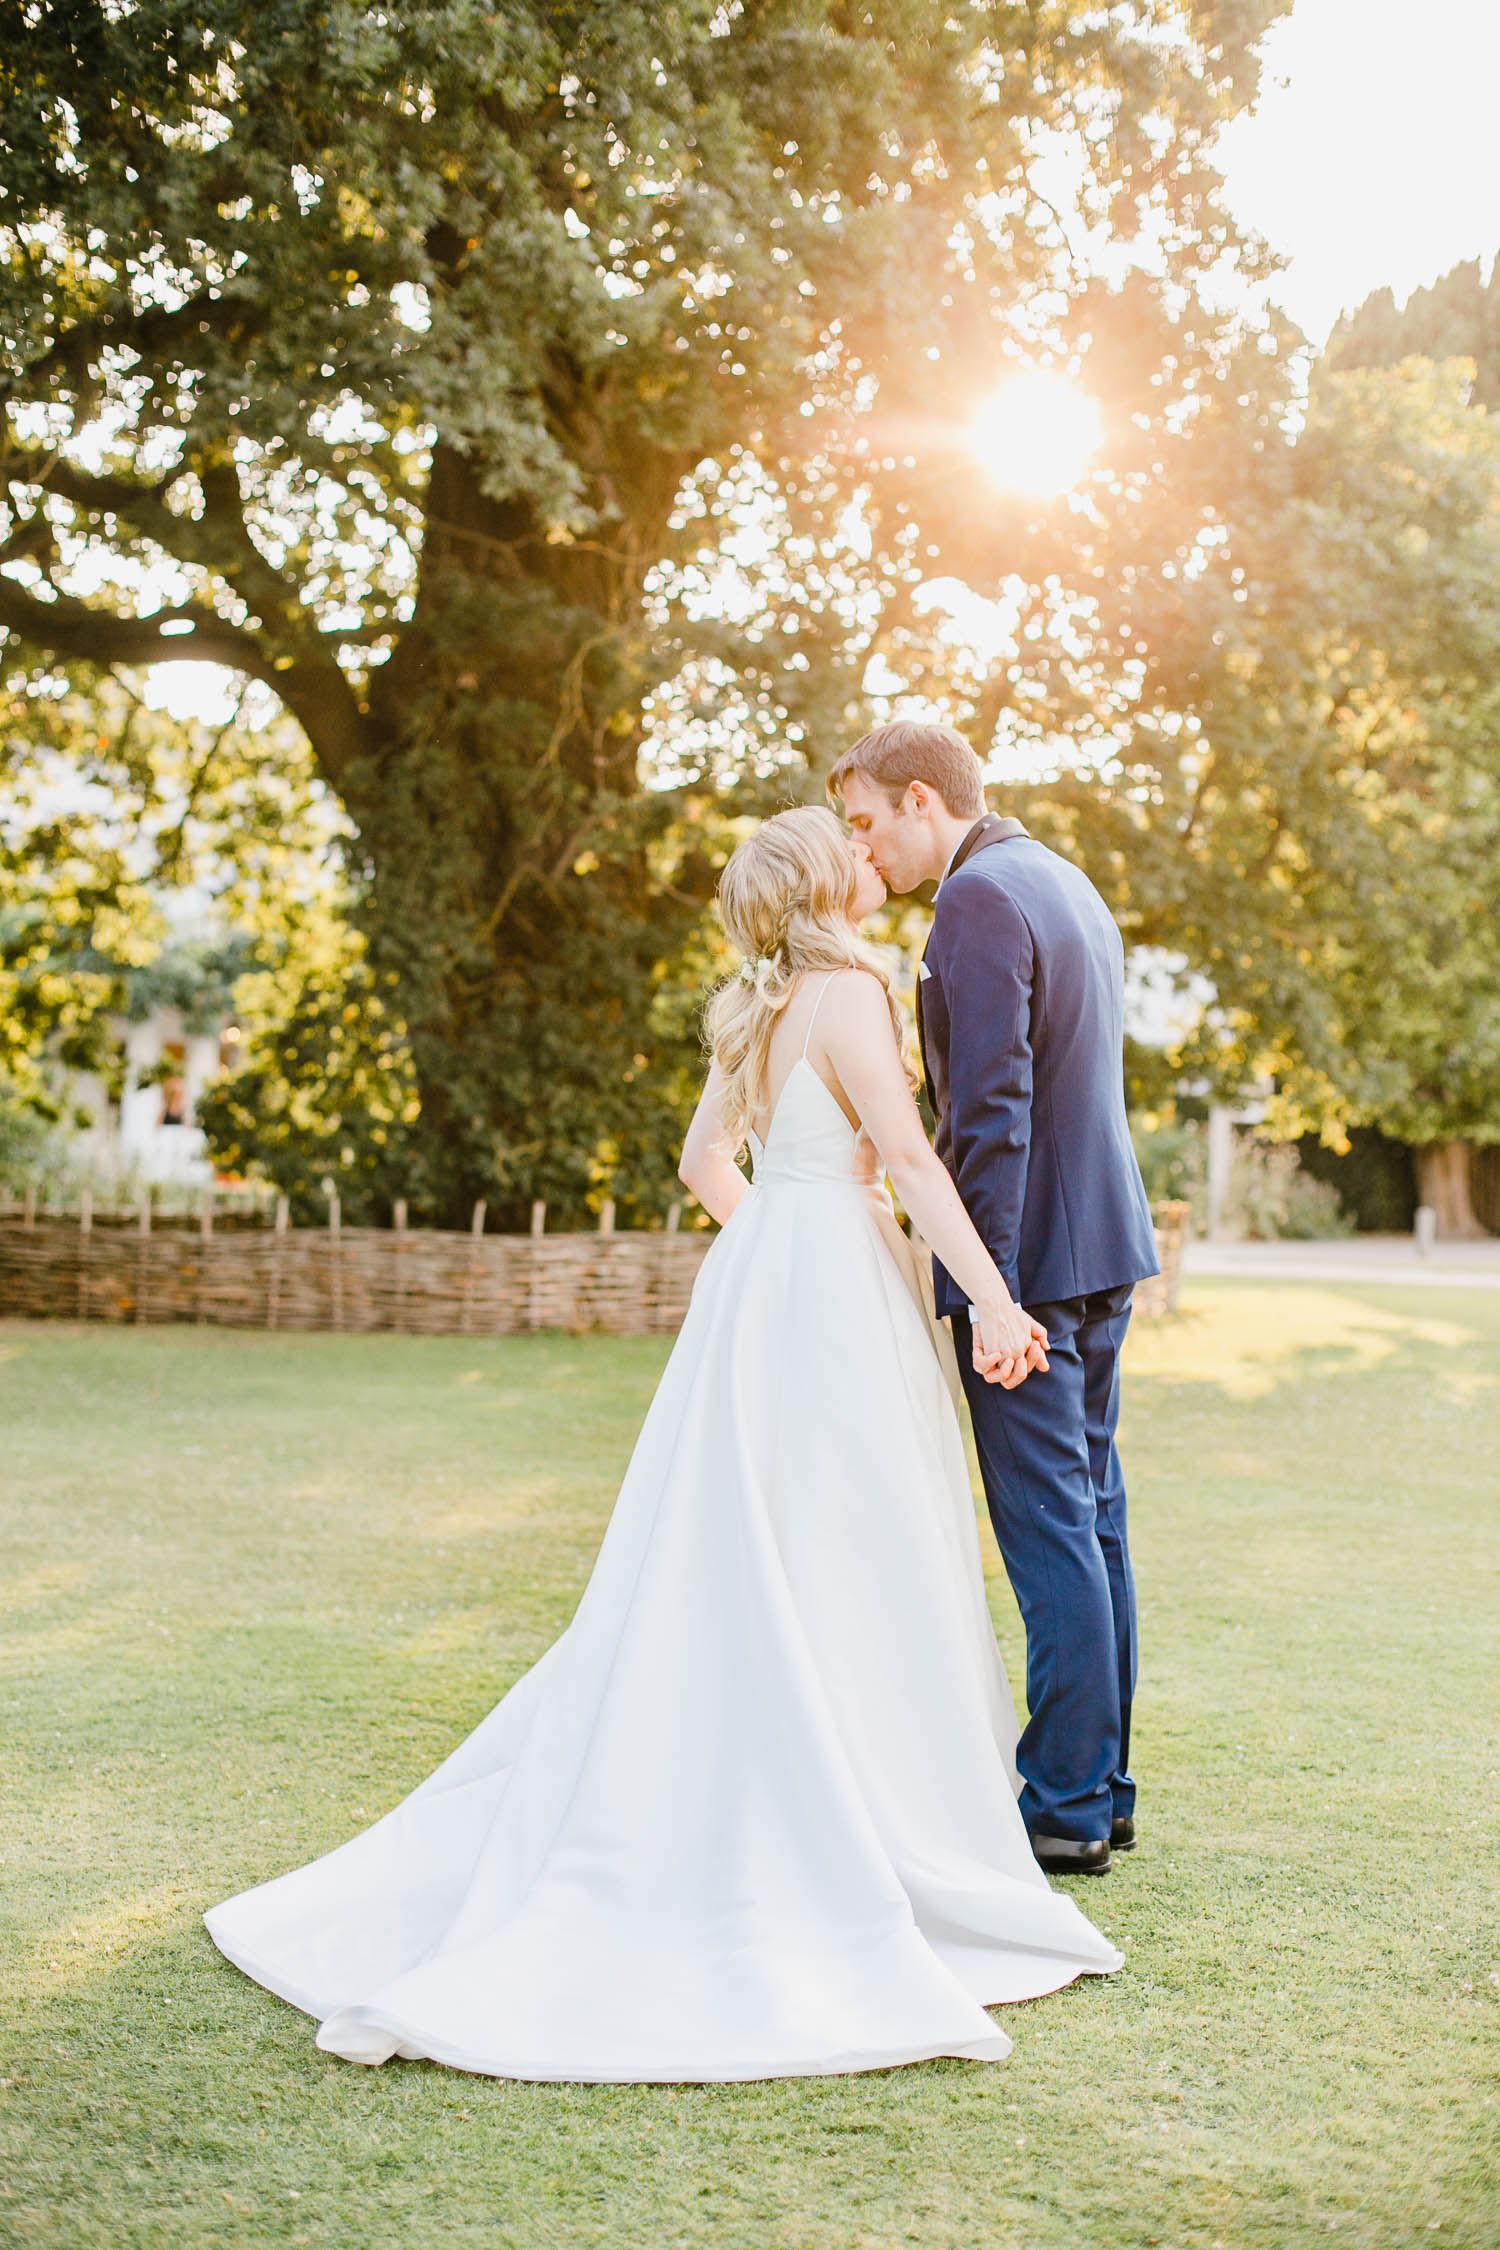 Justin Alexander Wedding Dress Ireland